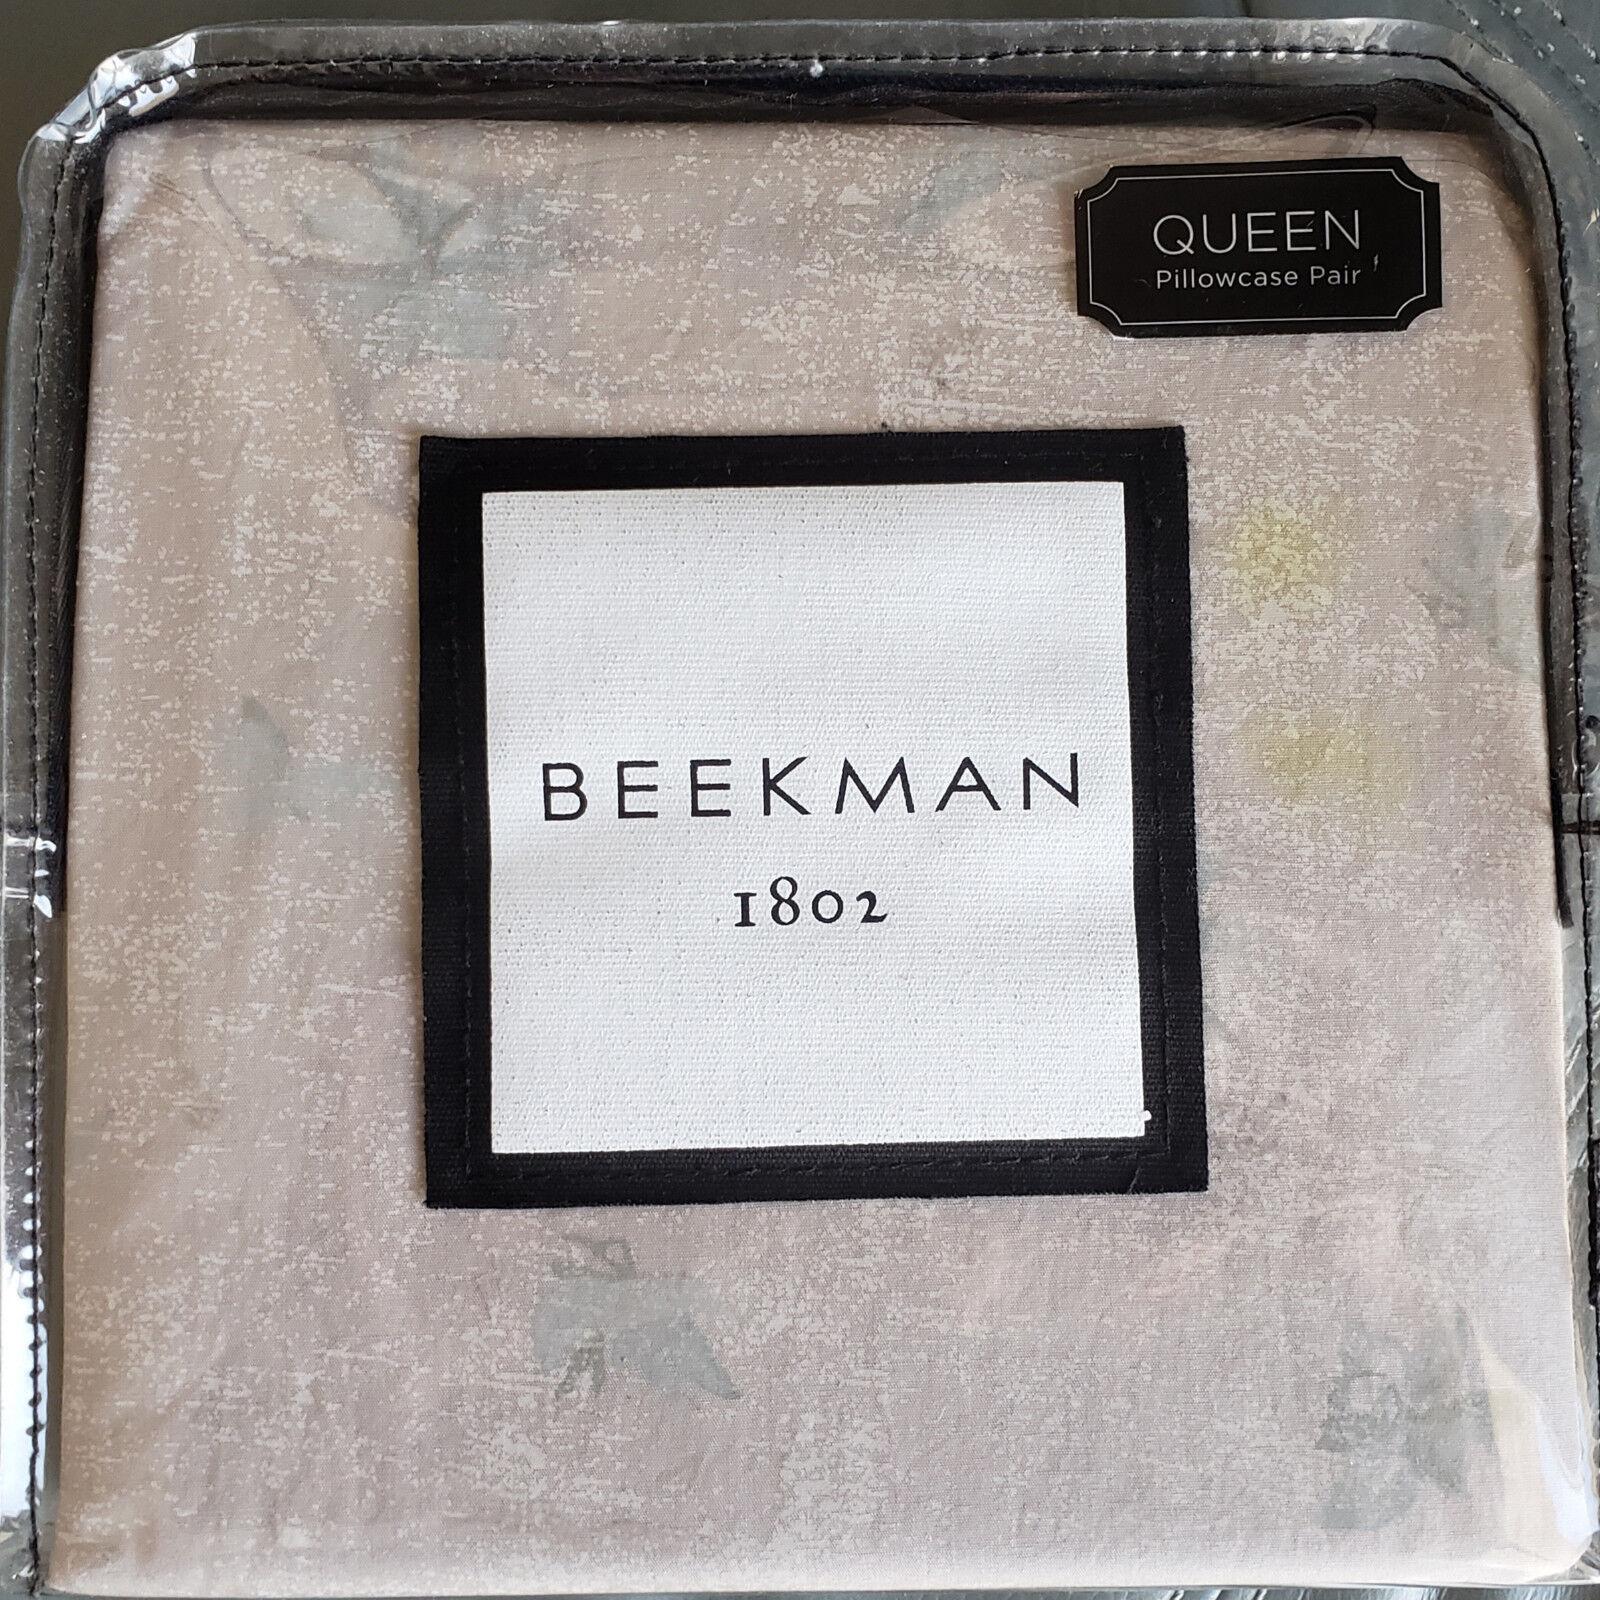 Beekman 1802 Minetto Queen Pillowcase Pair New